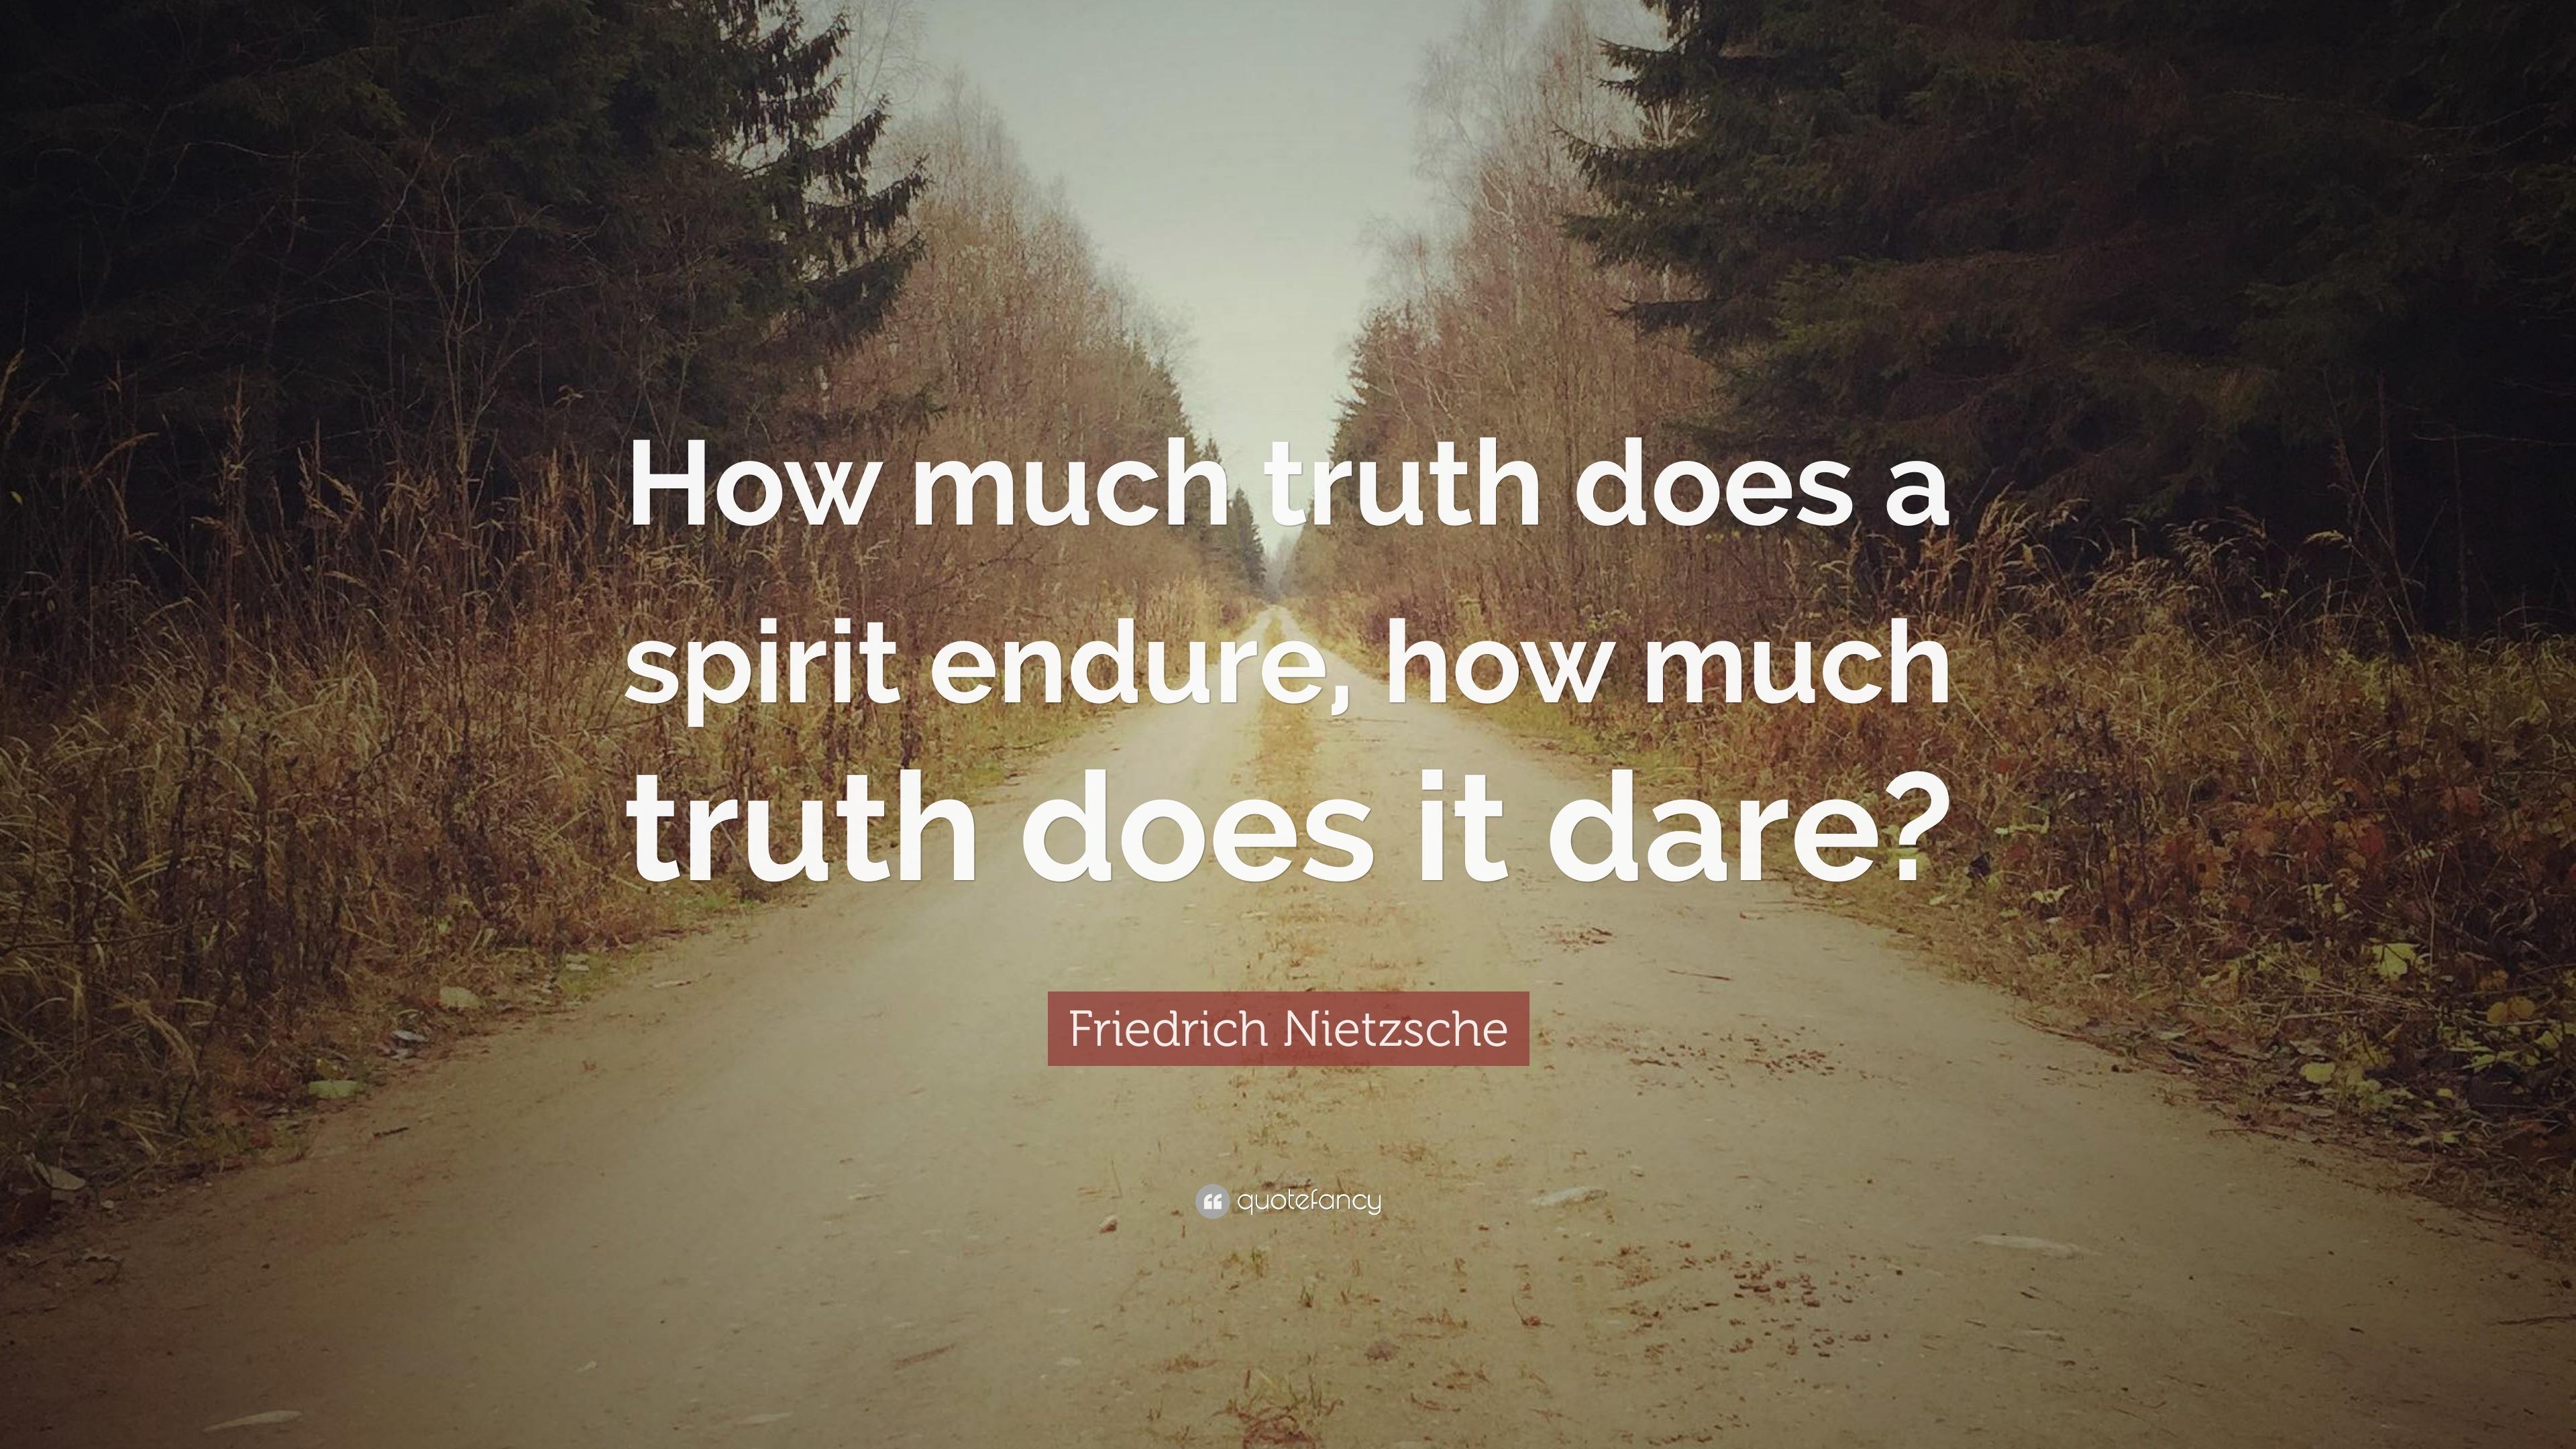 Friedrich Nietzsche Quote How Much Truth Does A Spirit Endure How